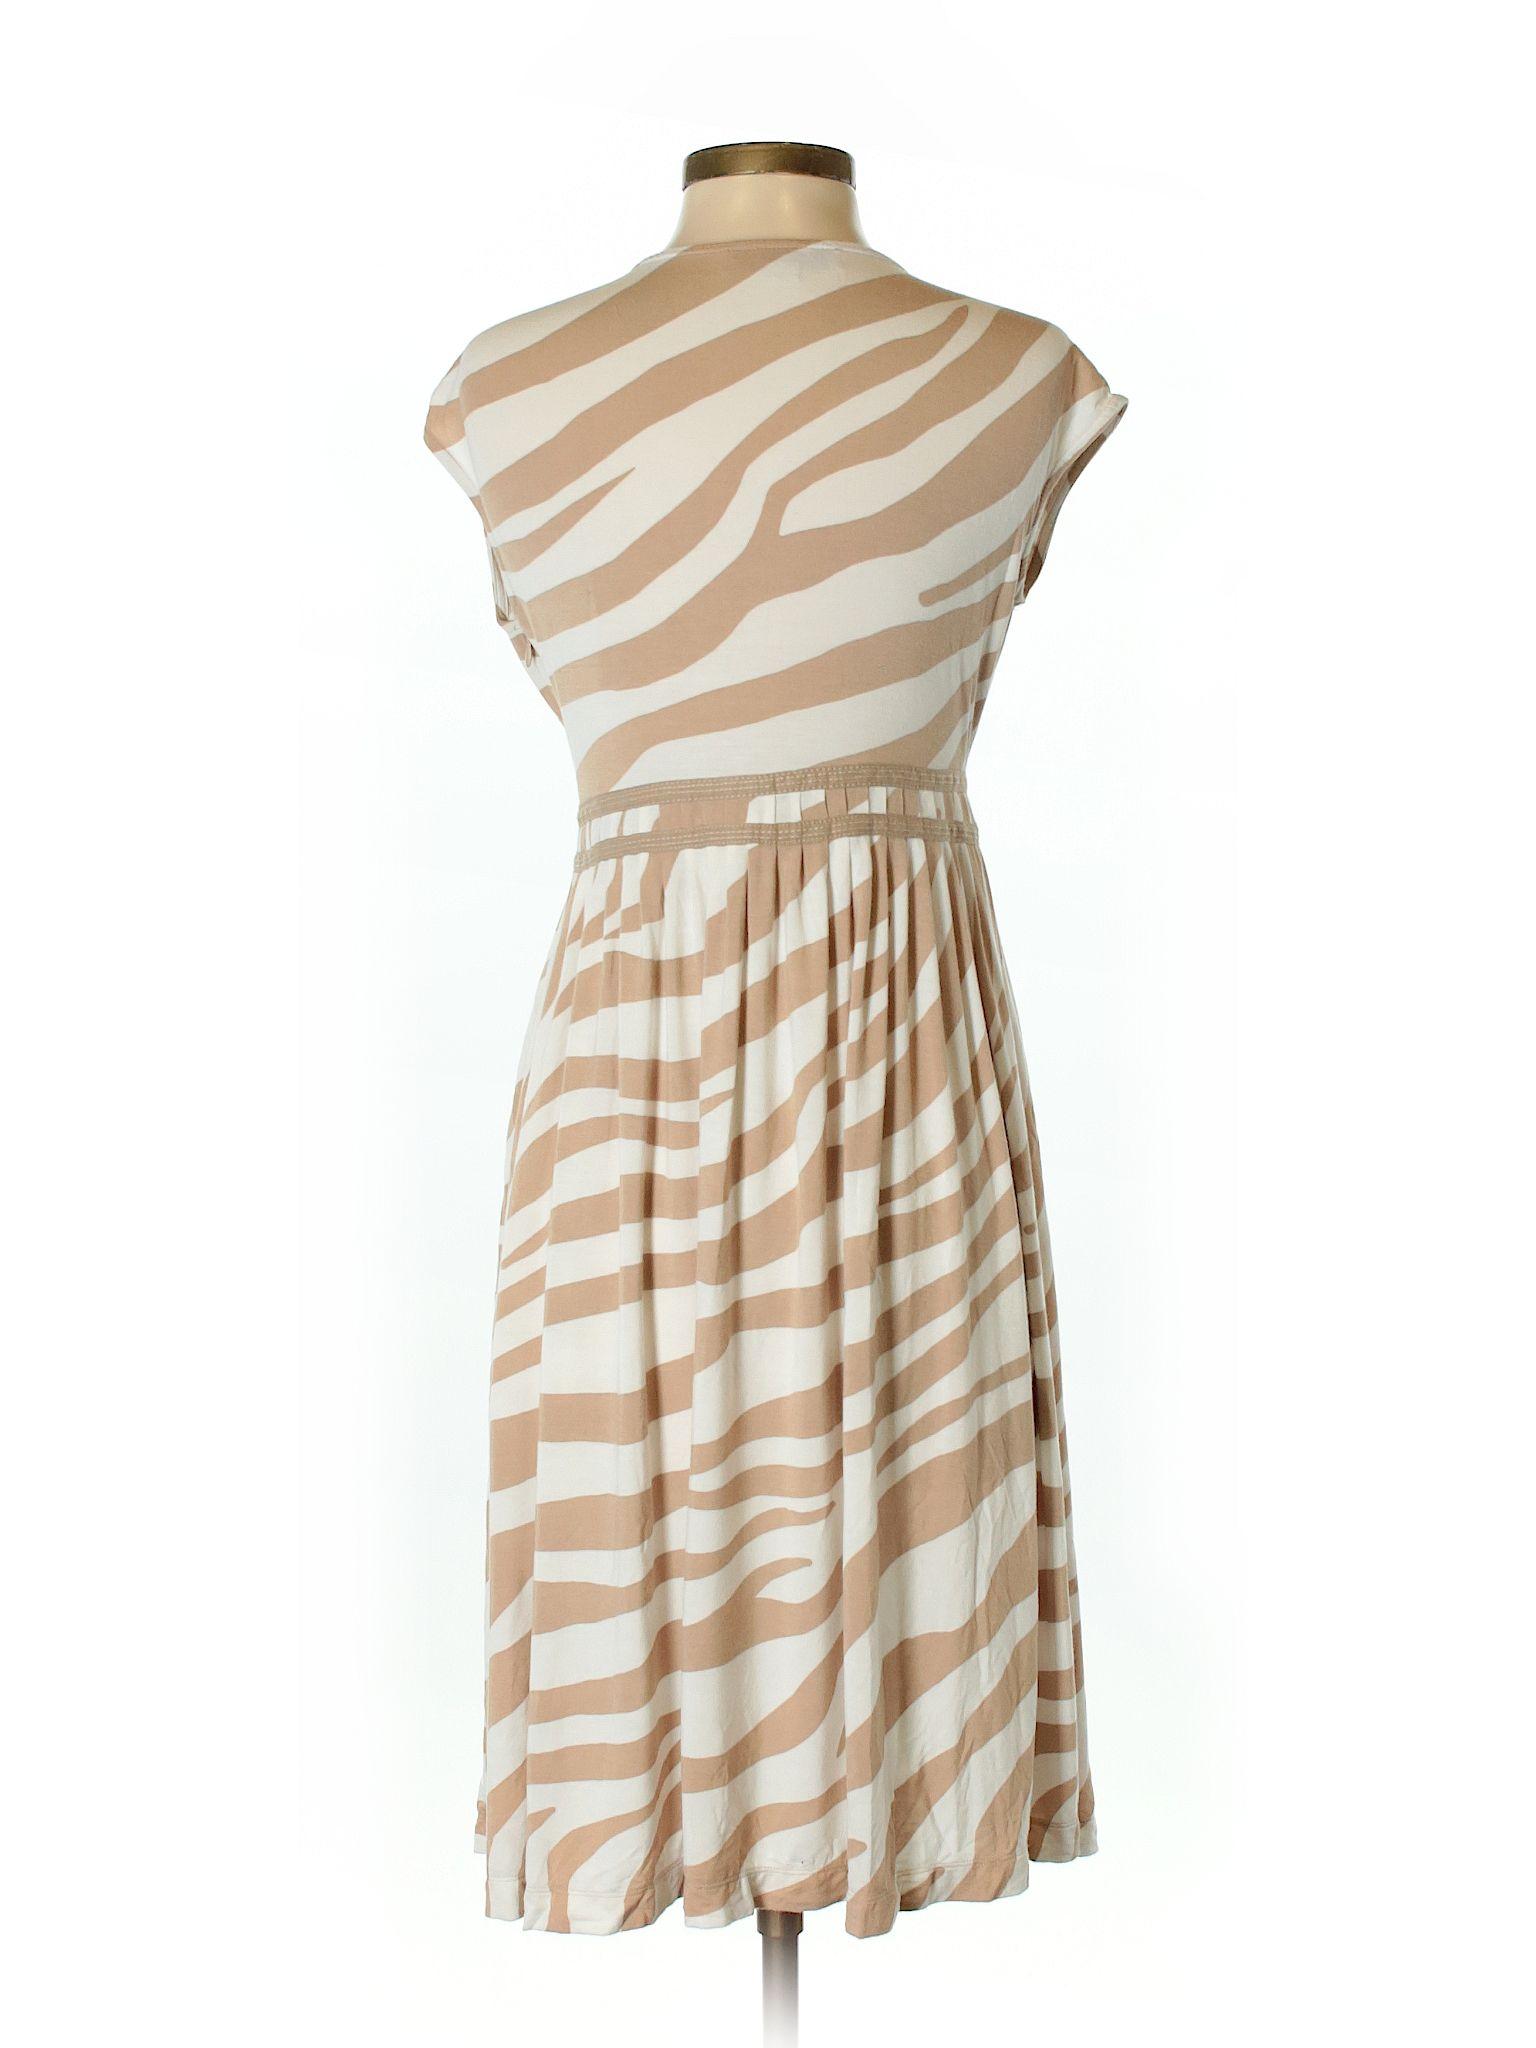 Ann Taylor Loft Casual Dress Size 200 Tan Womens Dresses